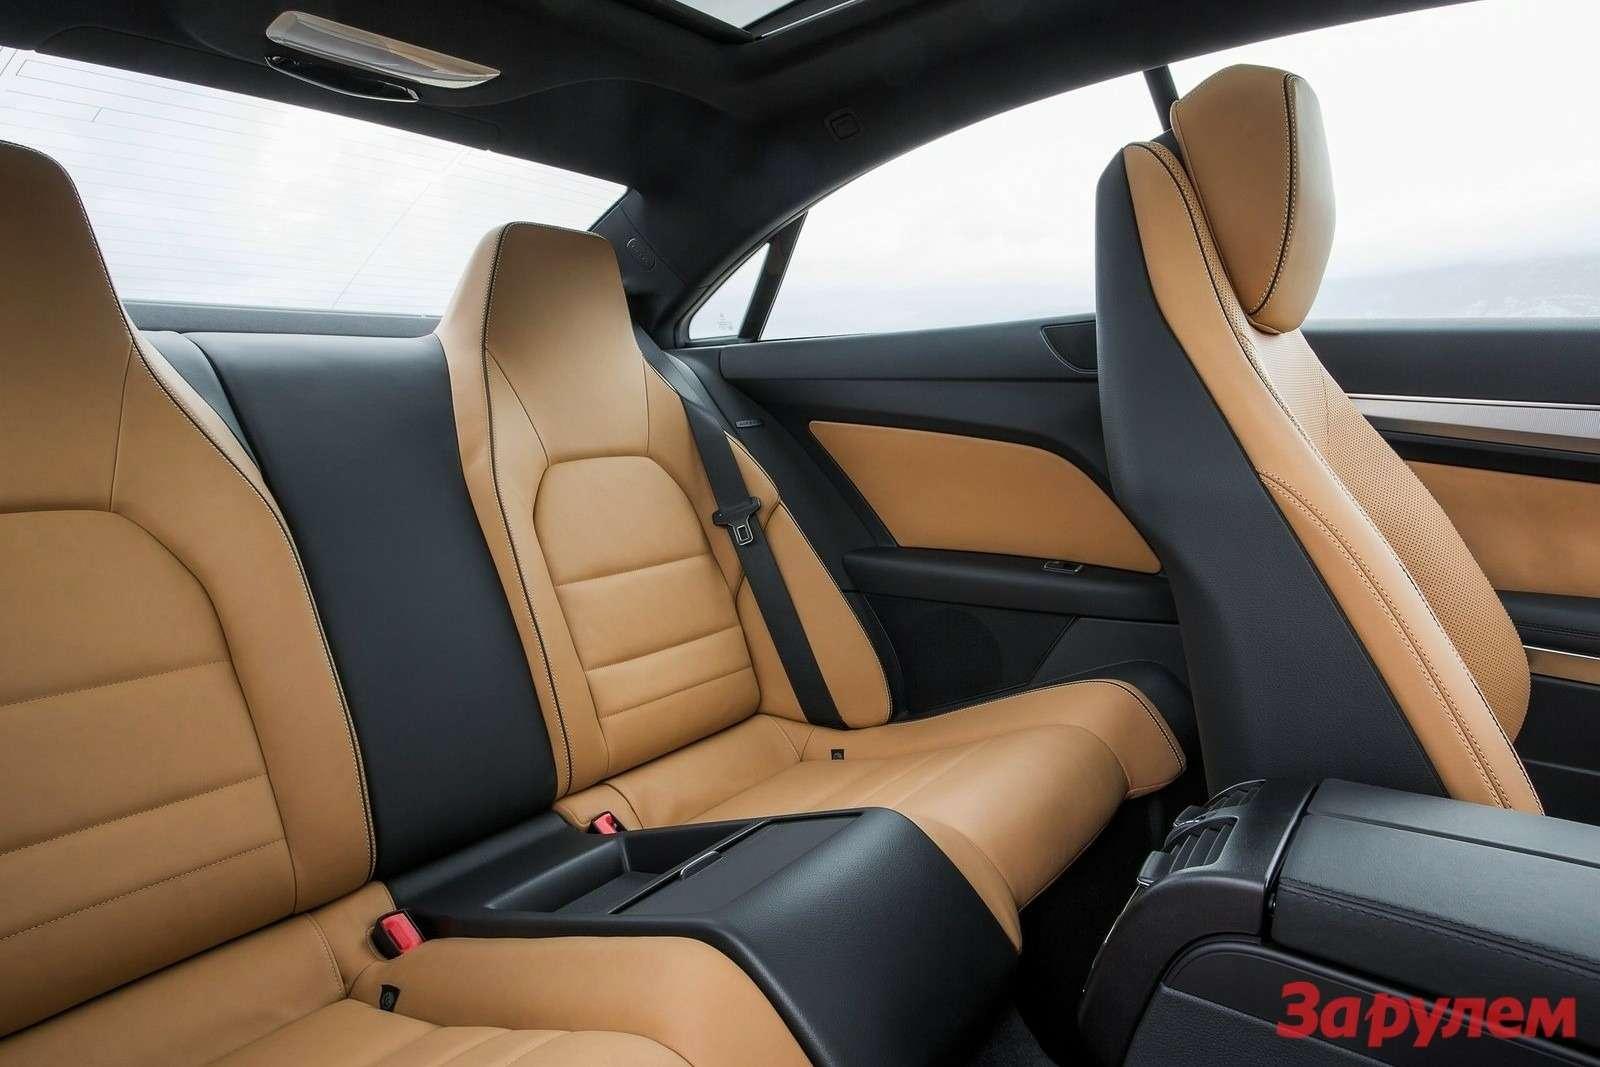 Mercedes-Benz-E-Class_Coupe_2014_1600x1200_wallpaper_17